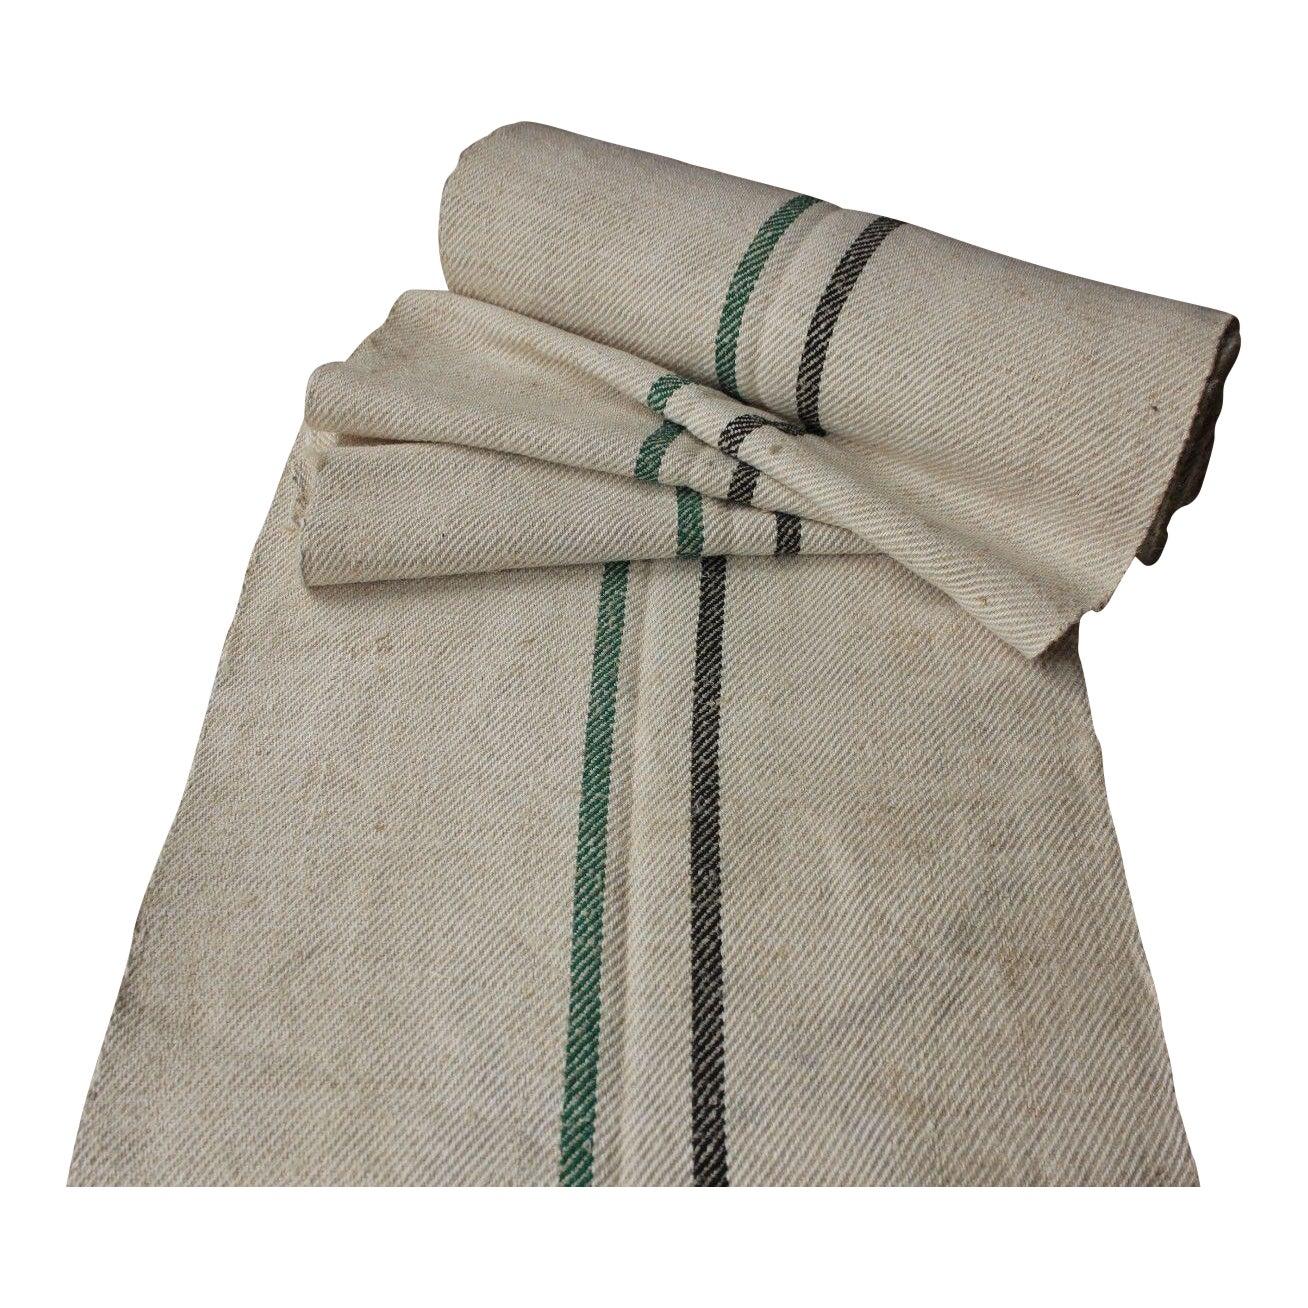 Grain Sack Fabric Black stripes Antique Grain sack fabric hand made